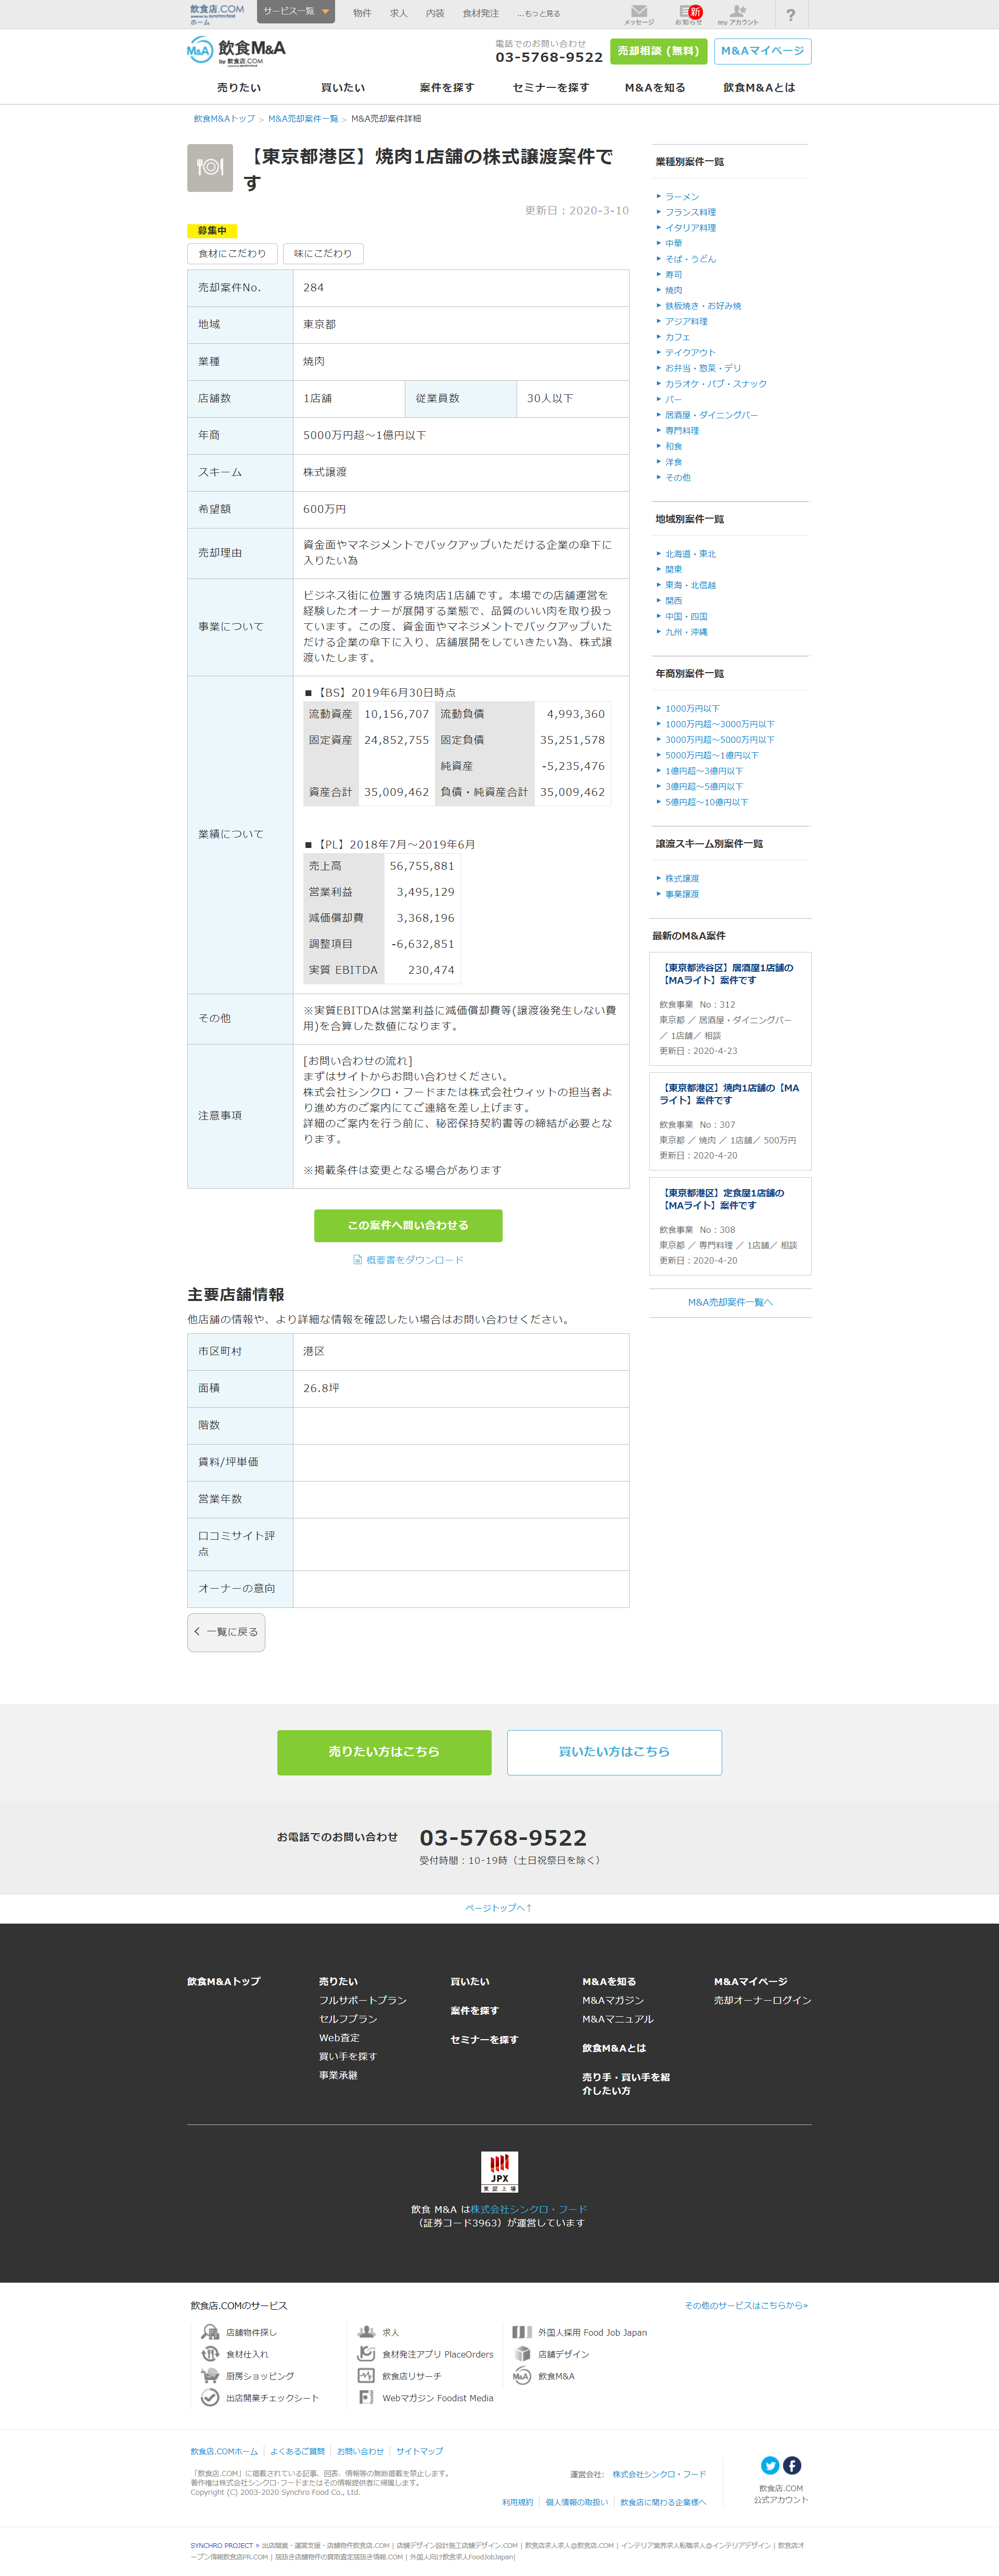 screencapture-inshokuten-ma-sale-cases-284-2020-04-26-12_51_55.png